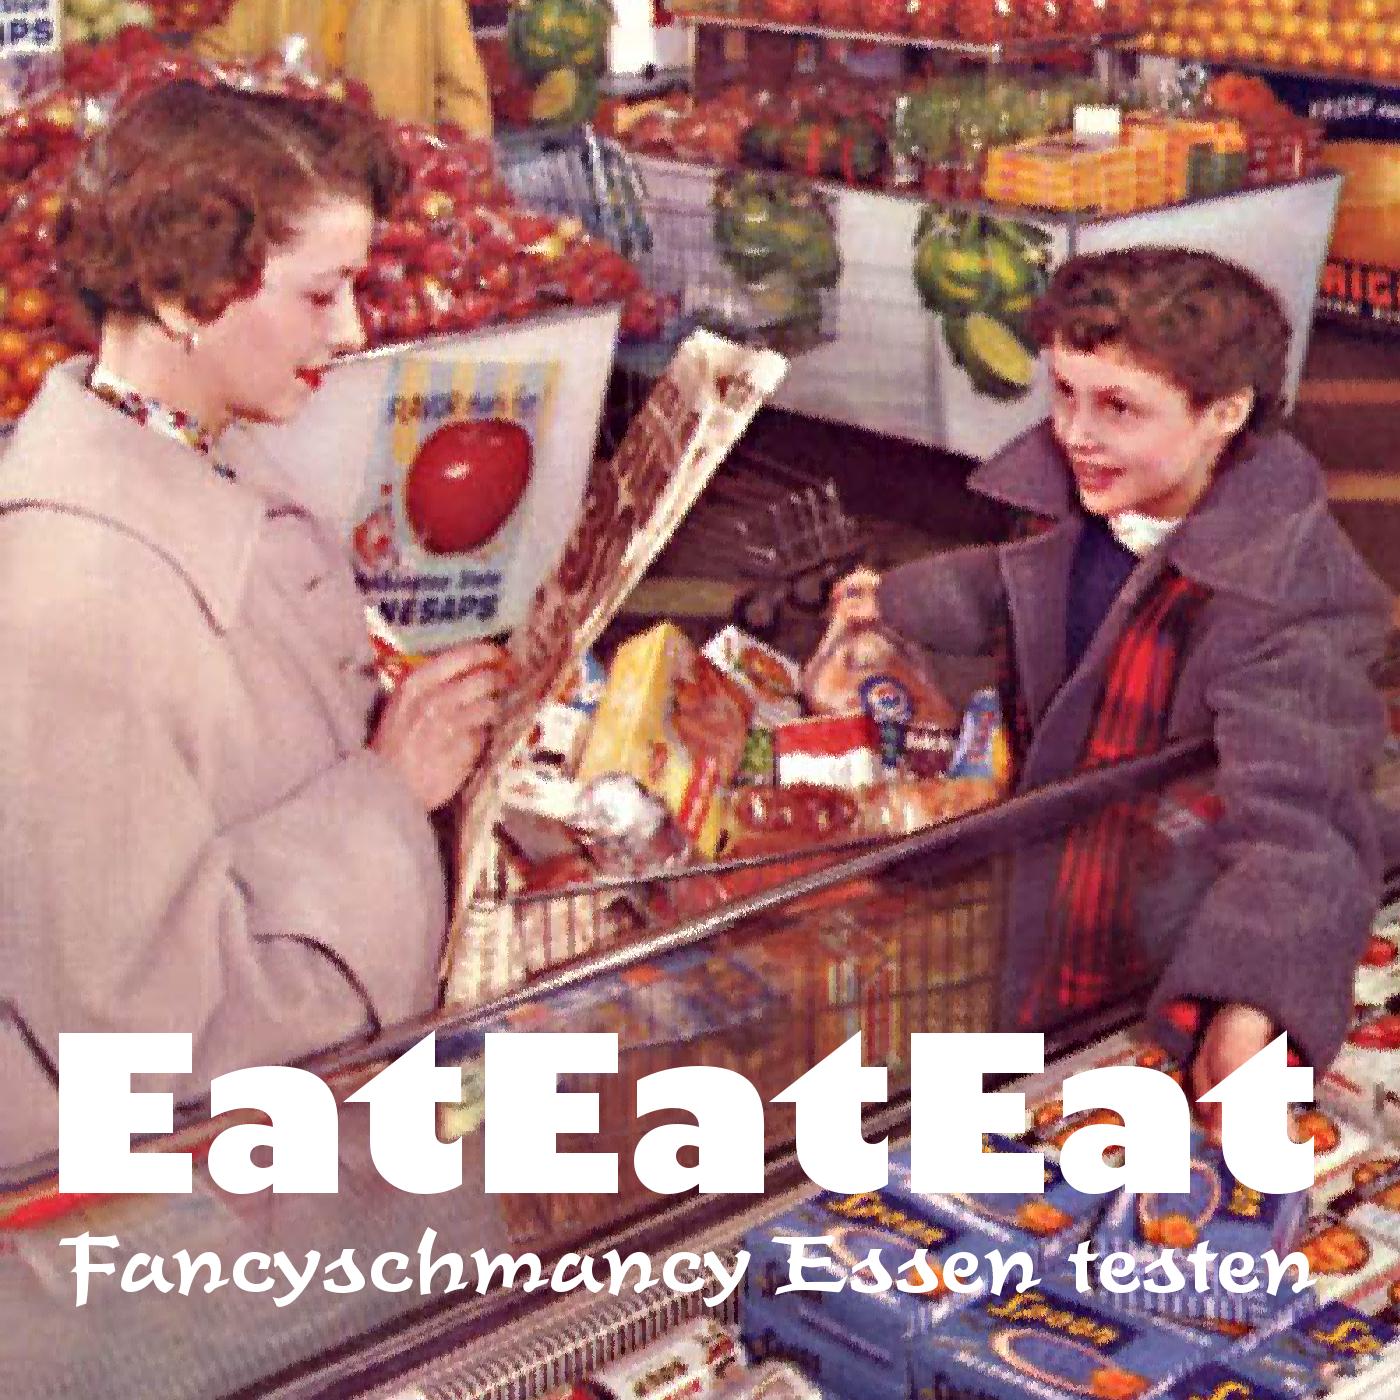 EatEatEat